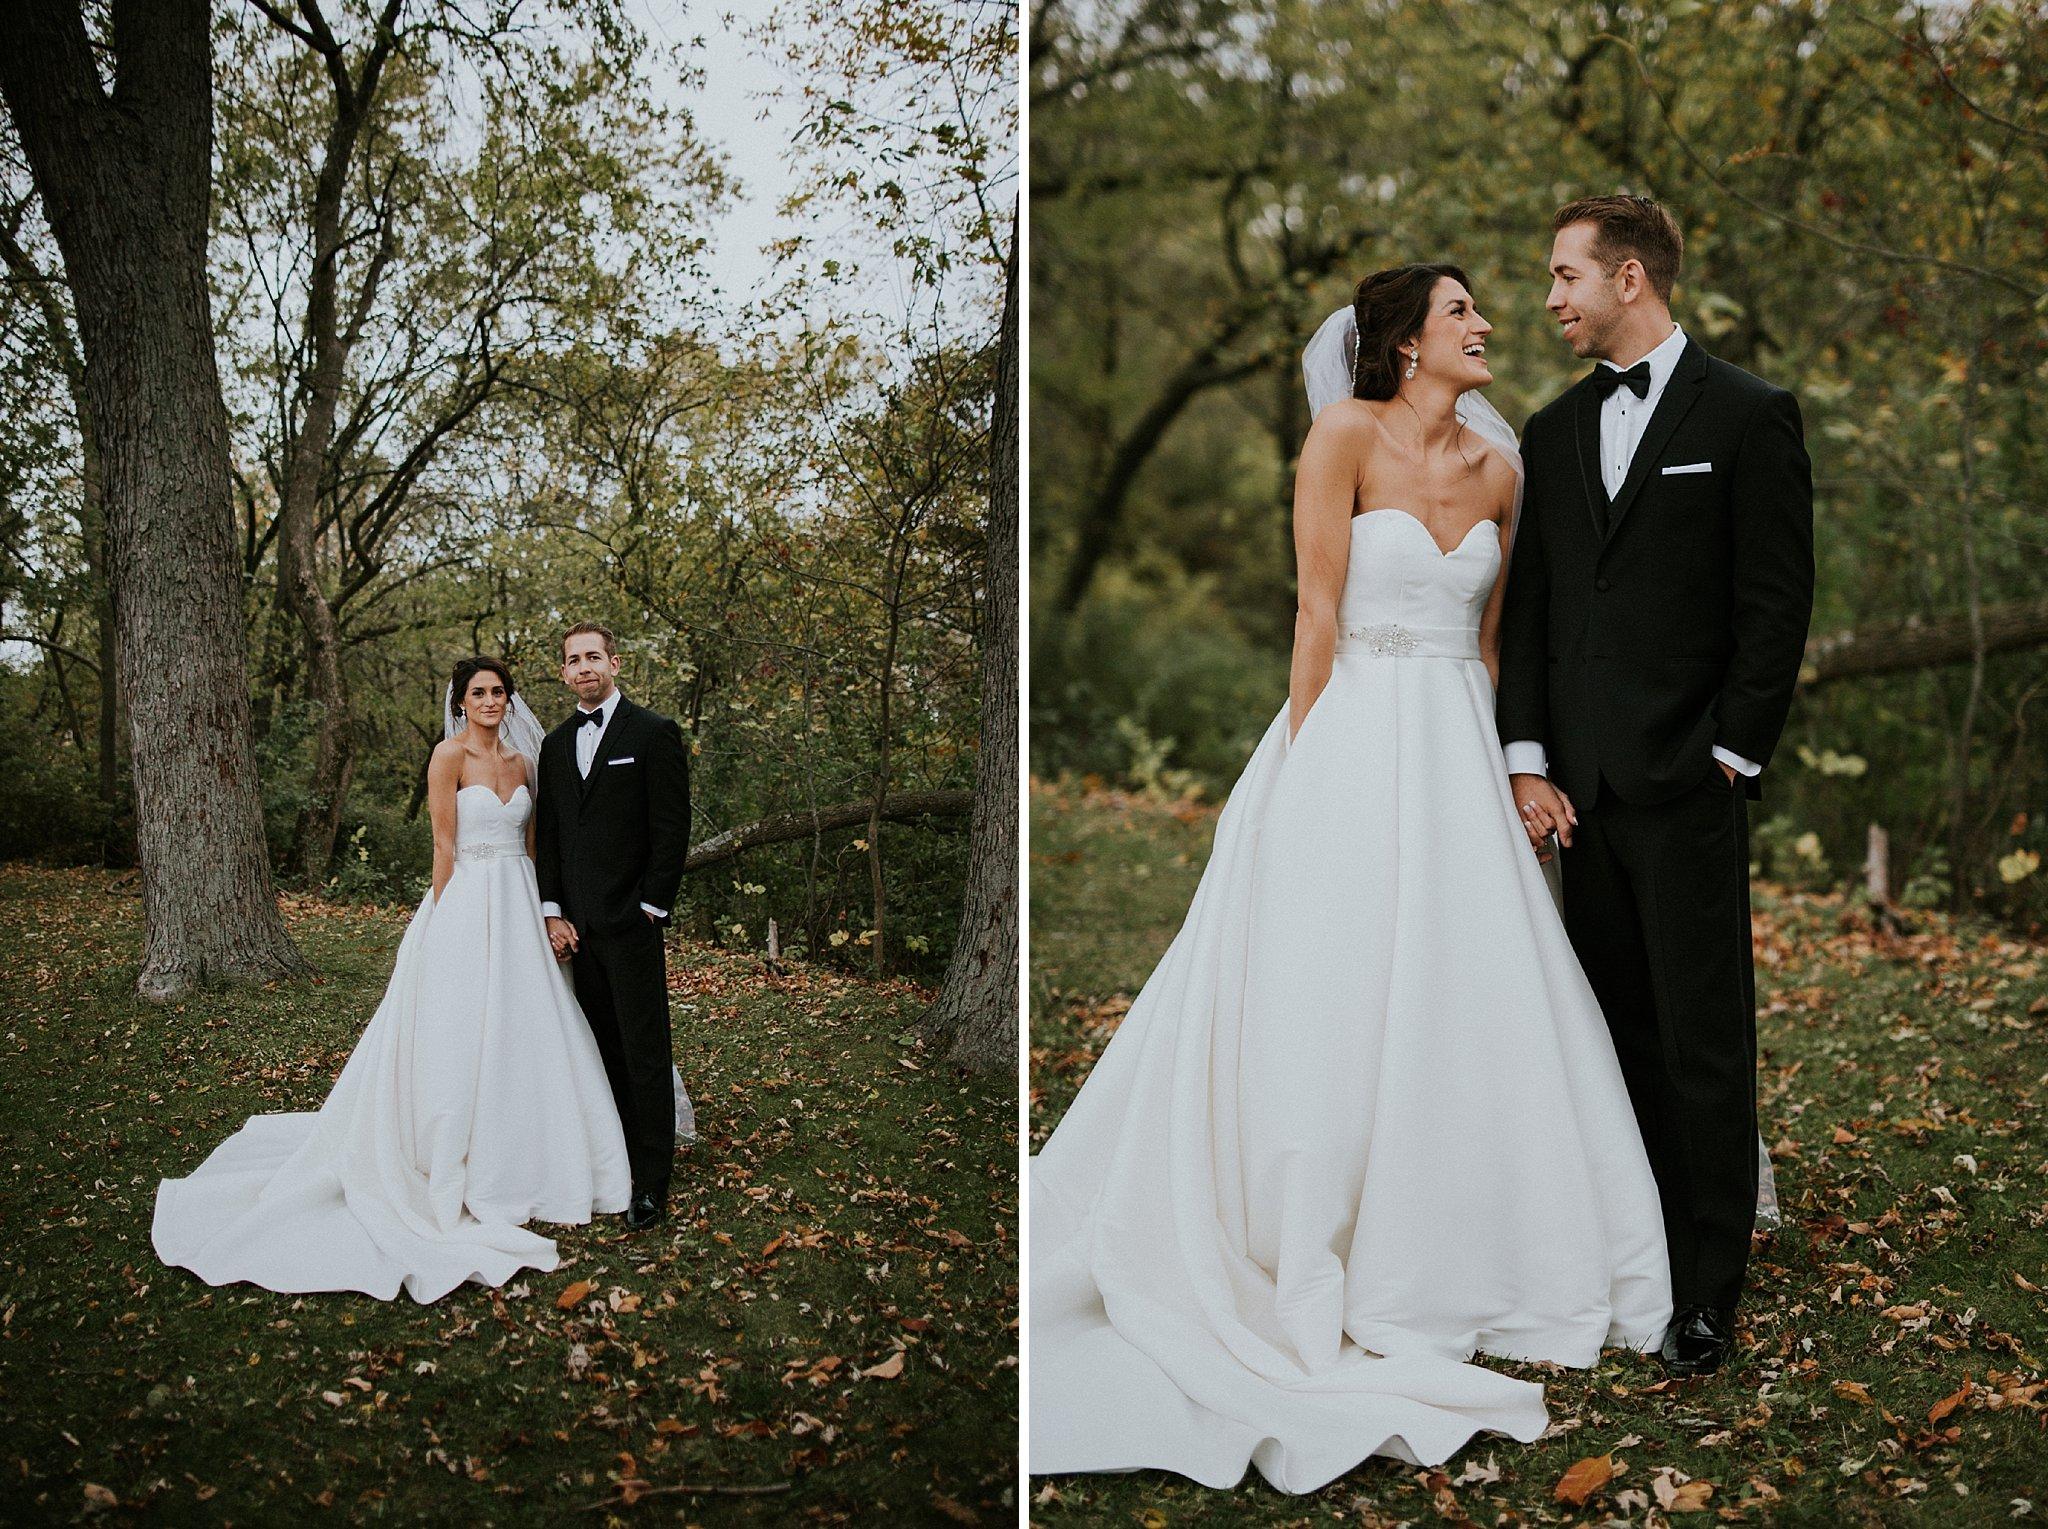 Matt-Lauren_St-Marys_Hilton-City-Center-Milwaukee-Wedding_liller-photo_0043.jpg